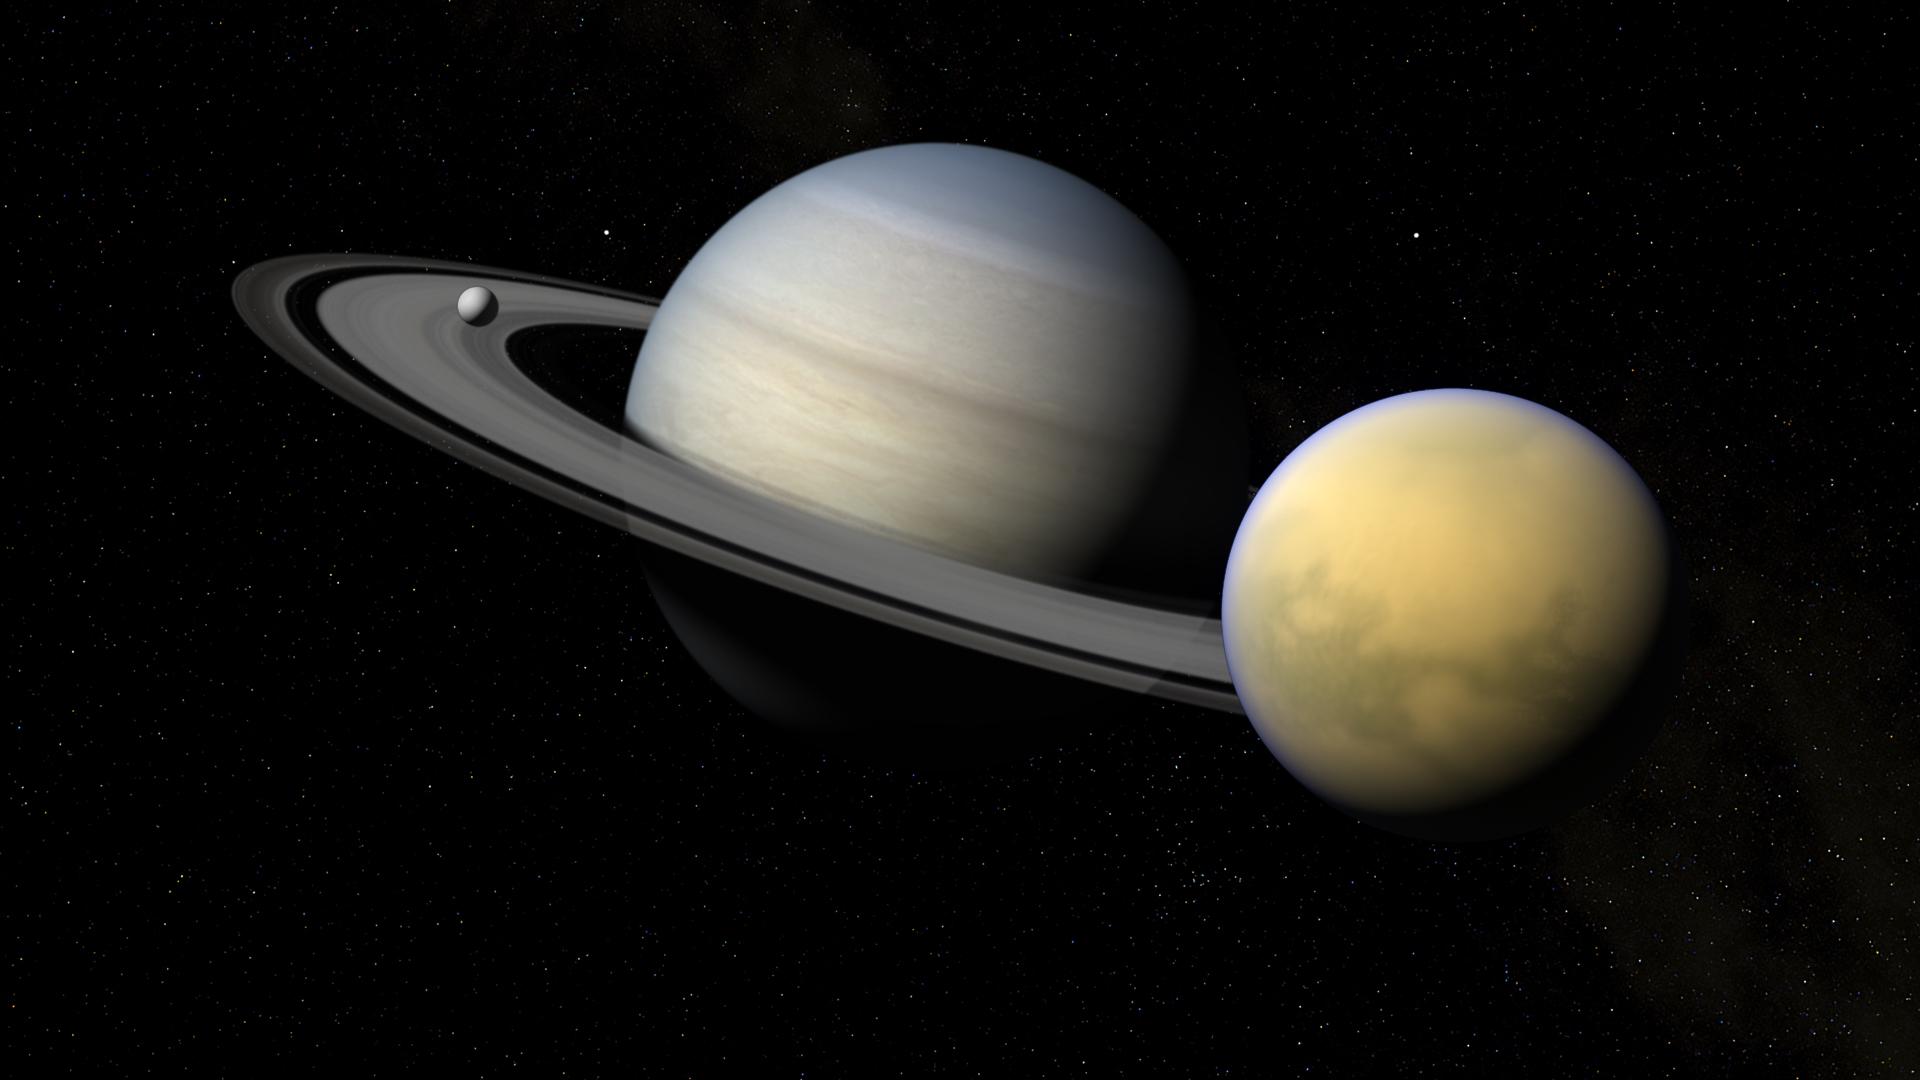 Desktop Wallpapers Planetary Ring Planet Titan Enceladus